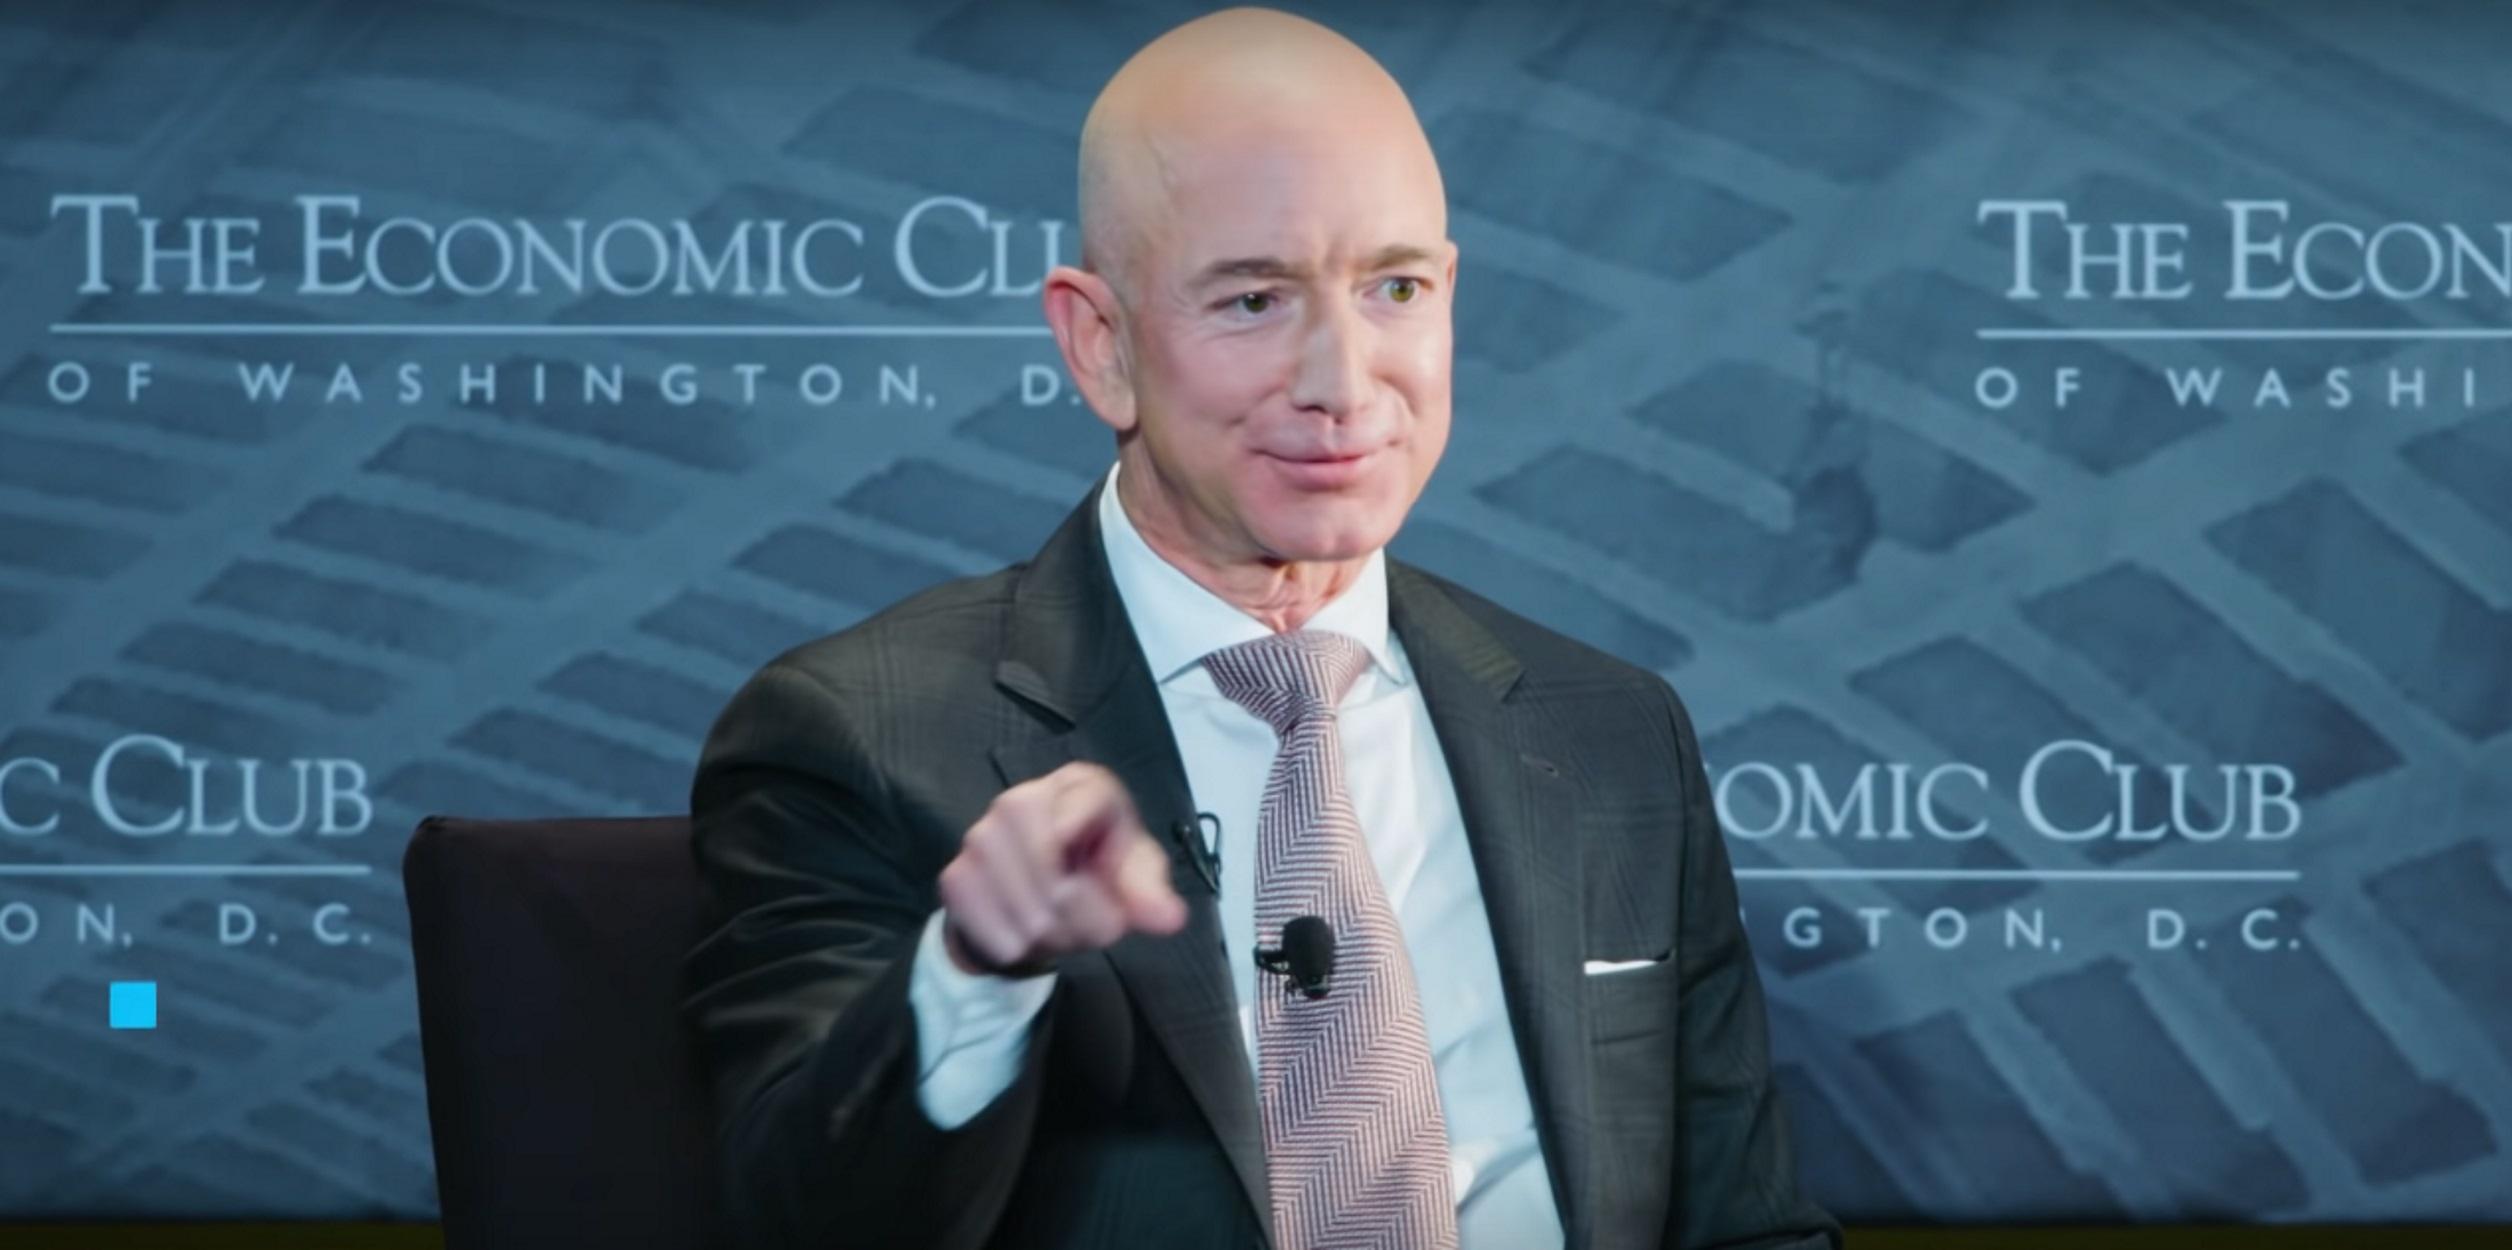 Jeff Bezos: Υπόσχεται να μειώσει τις εκπομπές αερίων της Amazon